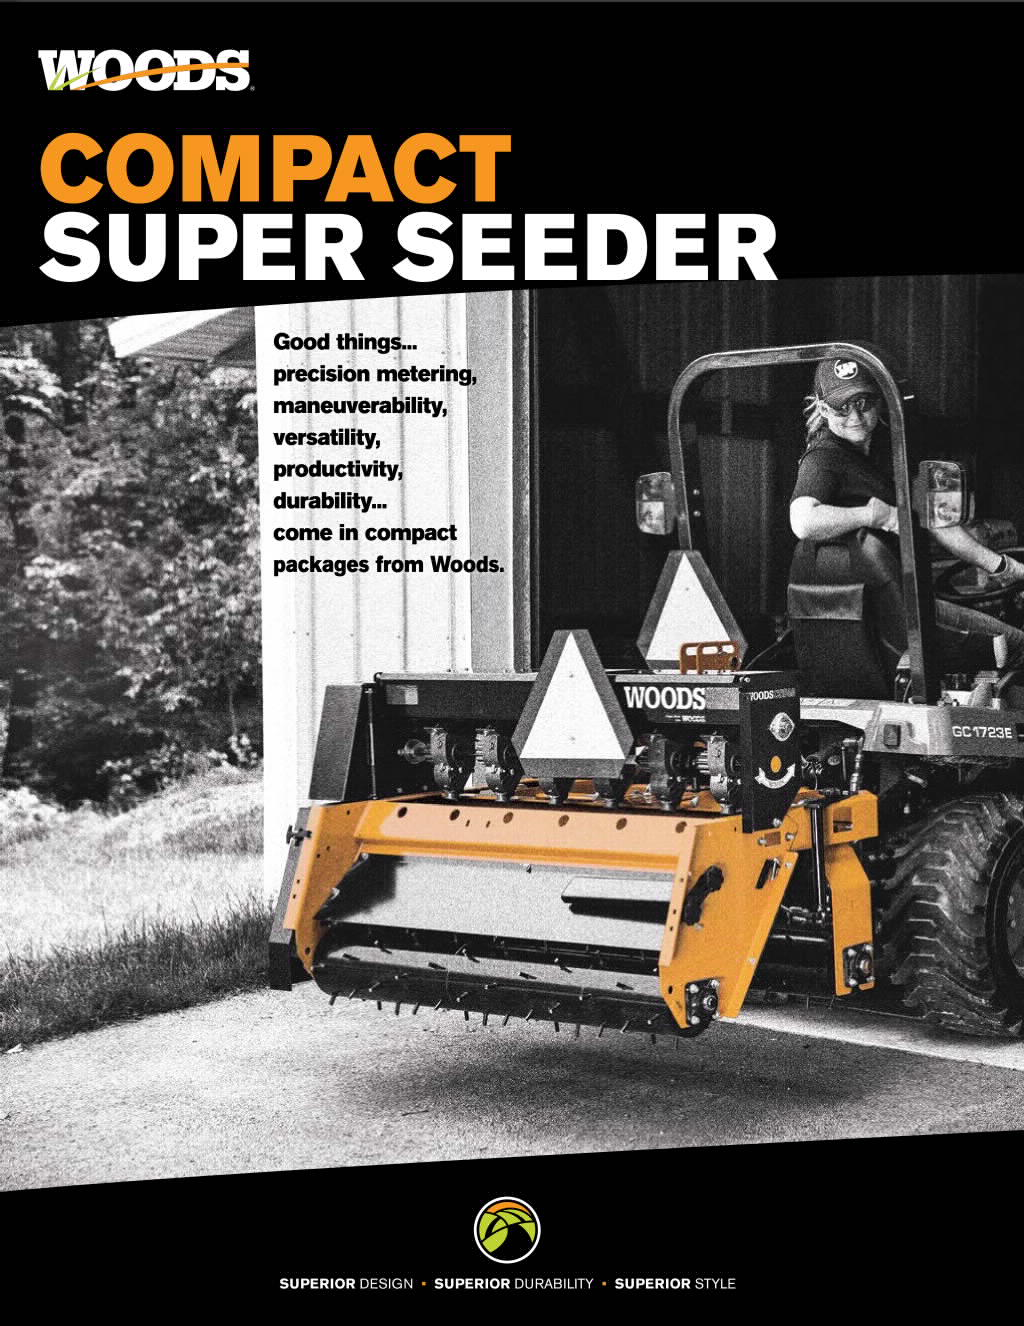 Compact Super Seeder Brochure